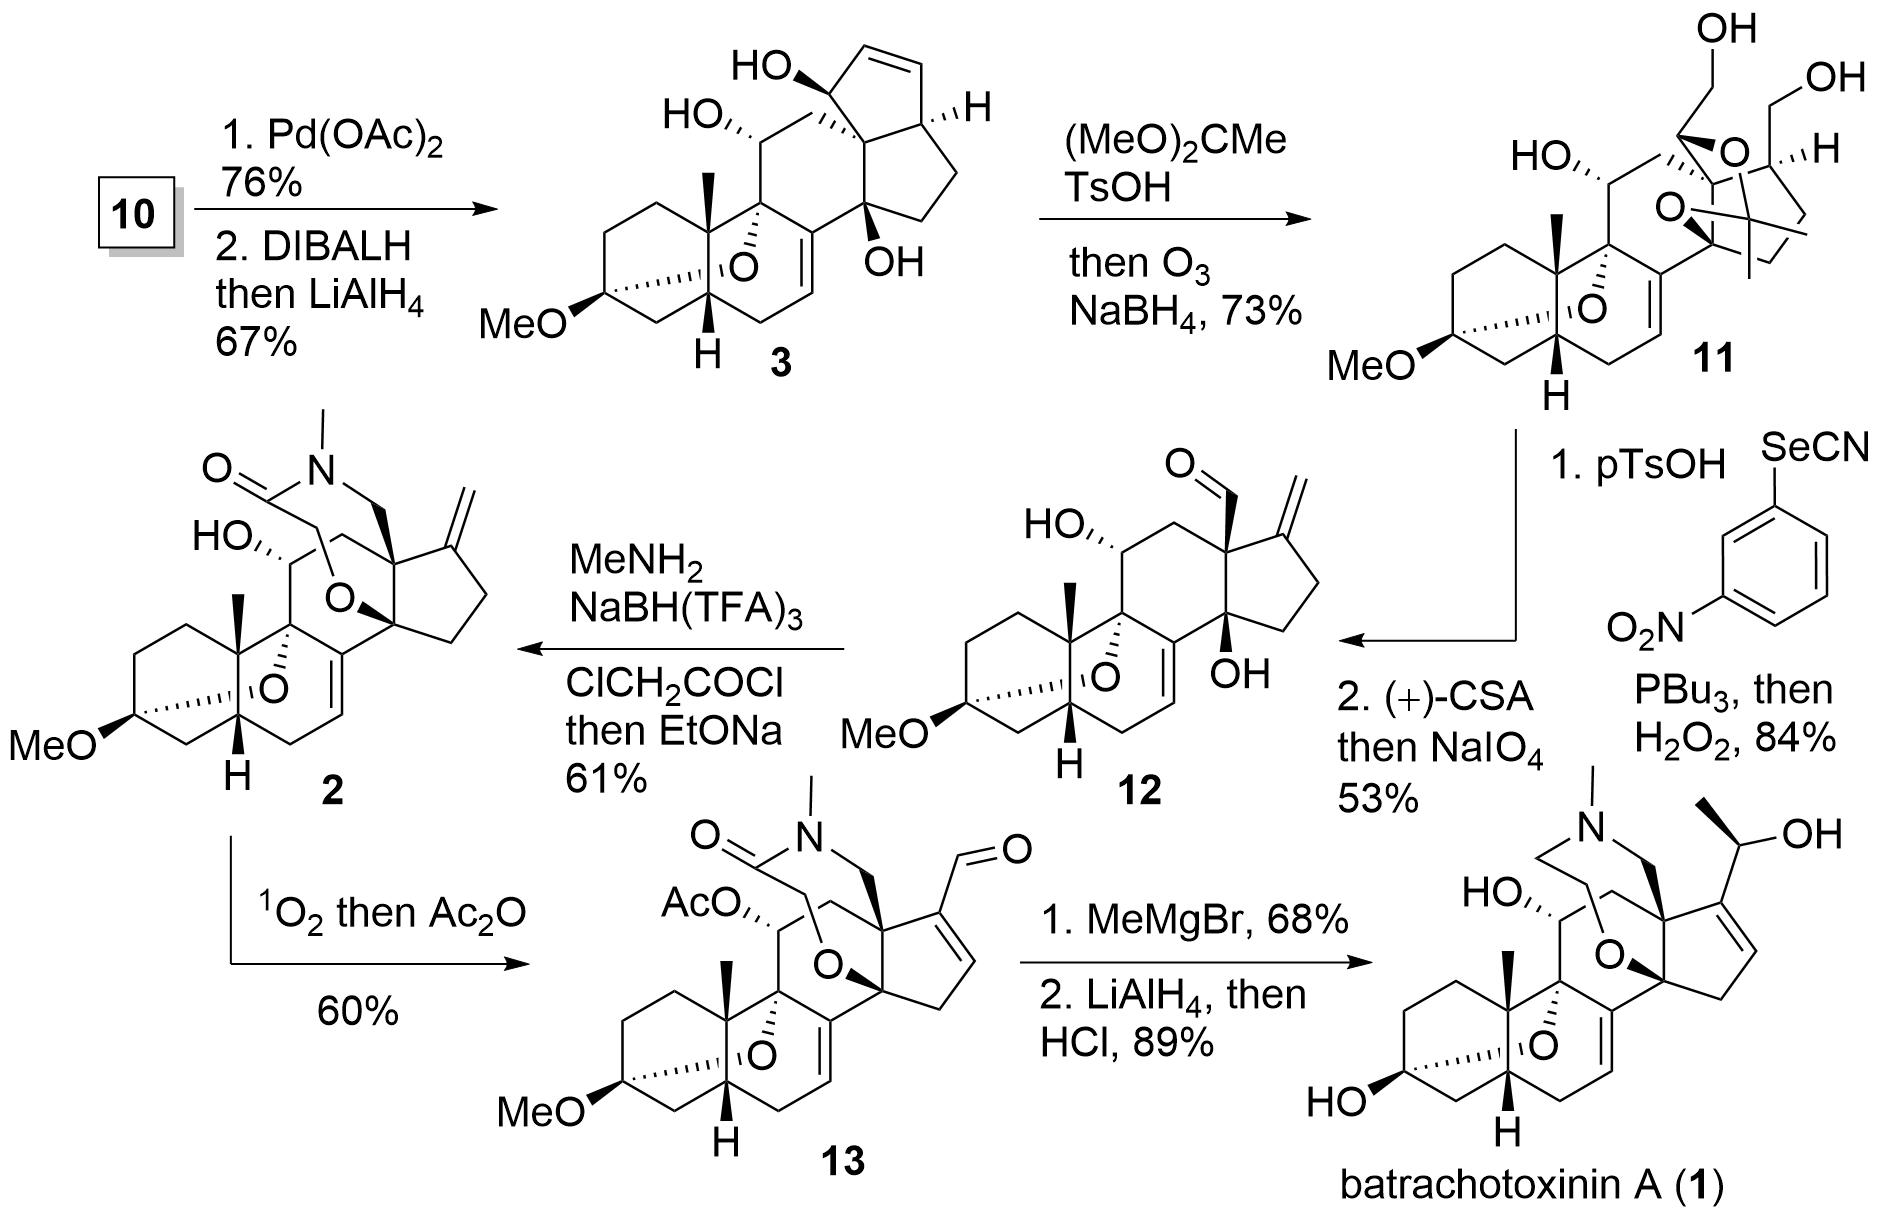 batrachotoxinin-3.png